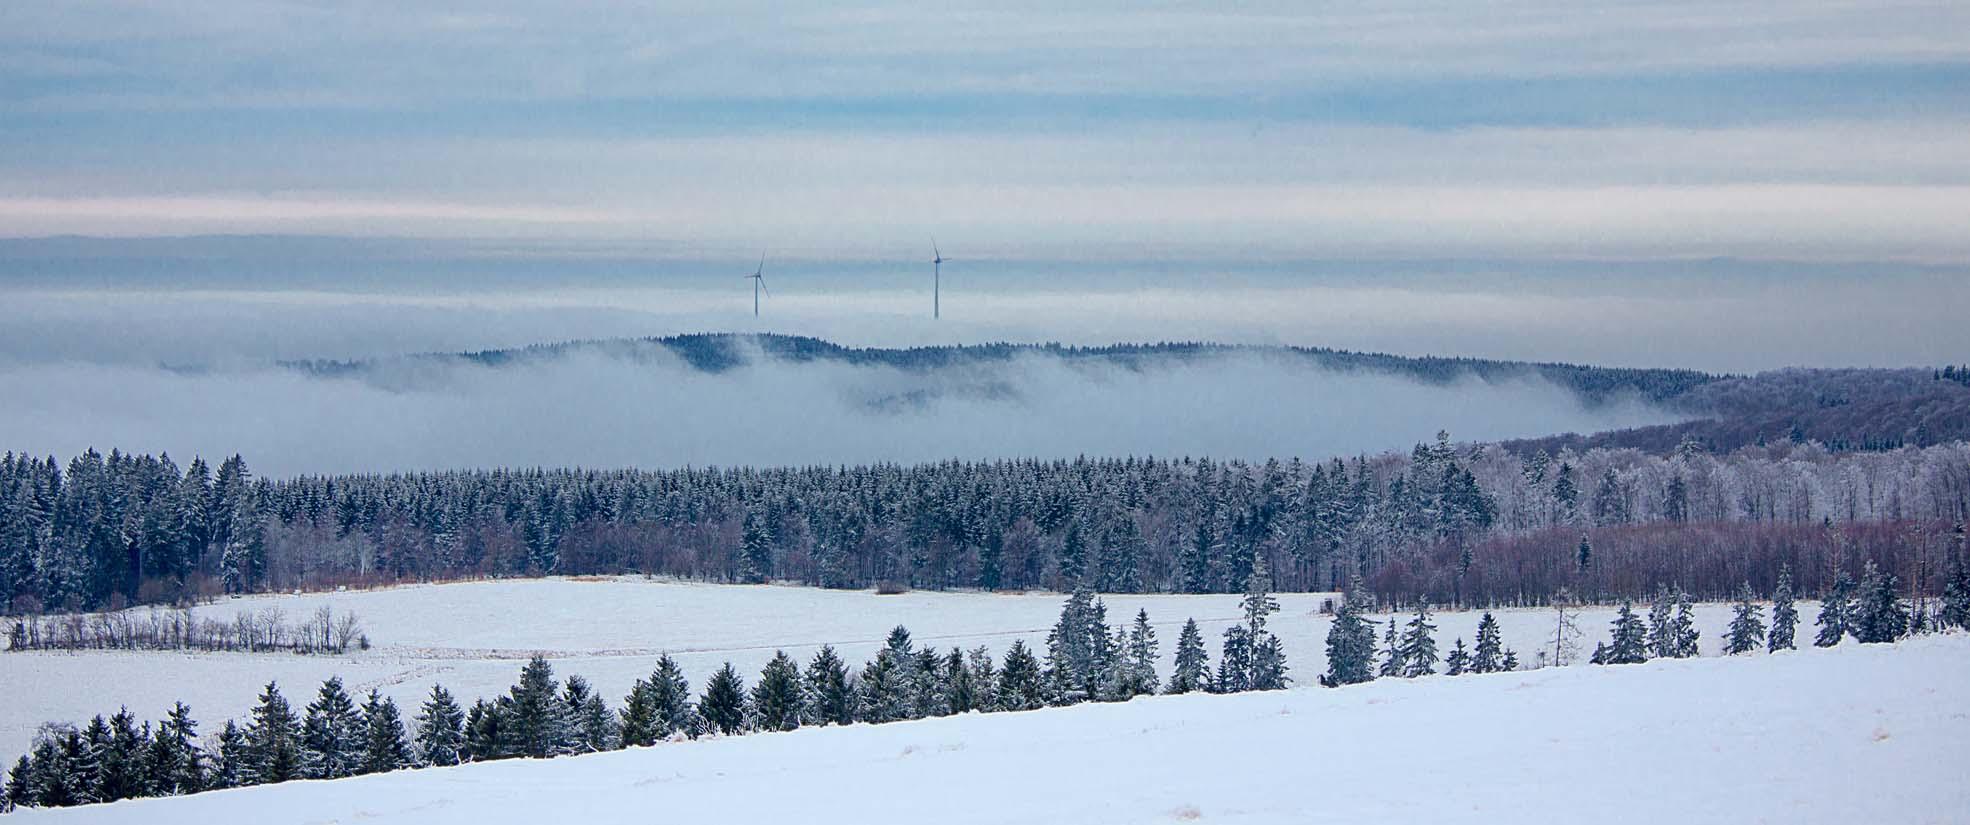 Der Hohe Vogelsberg